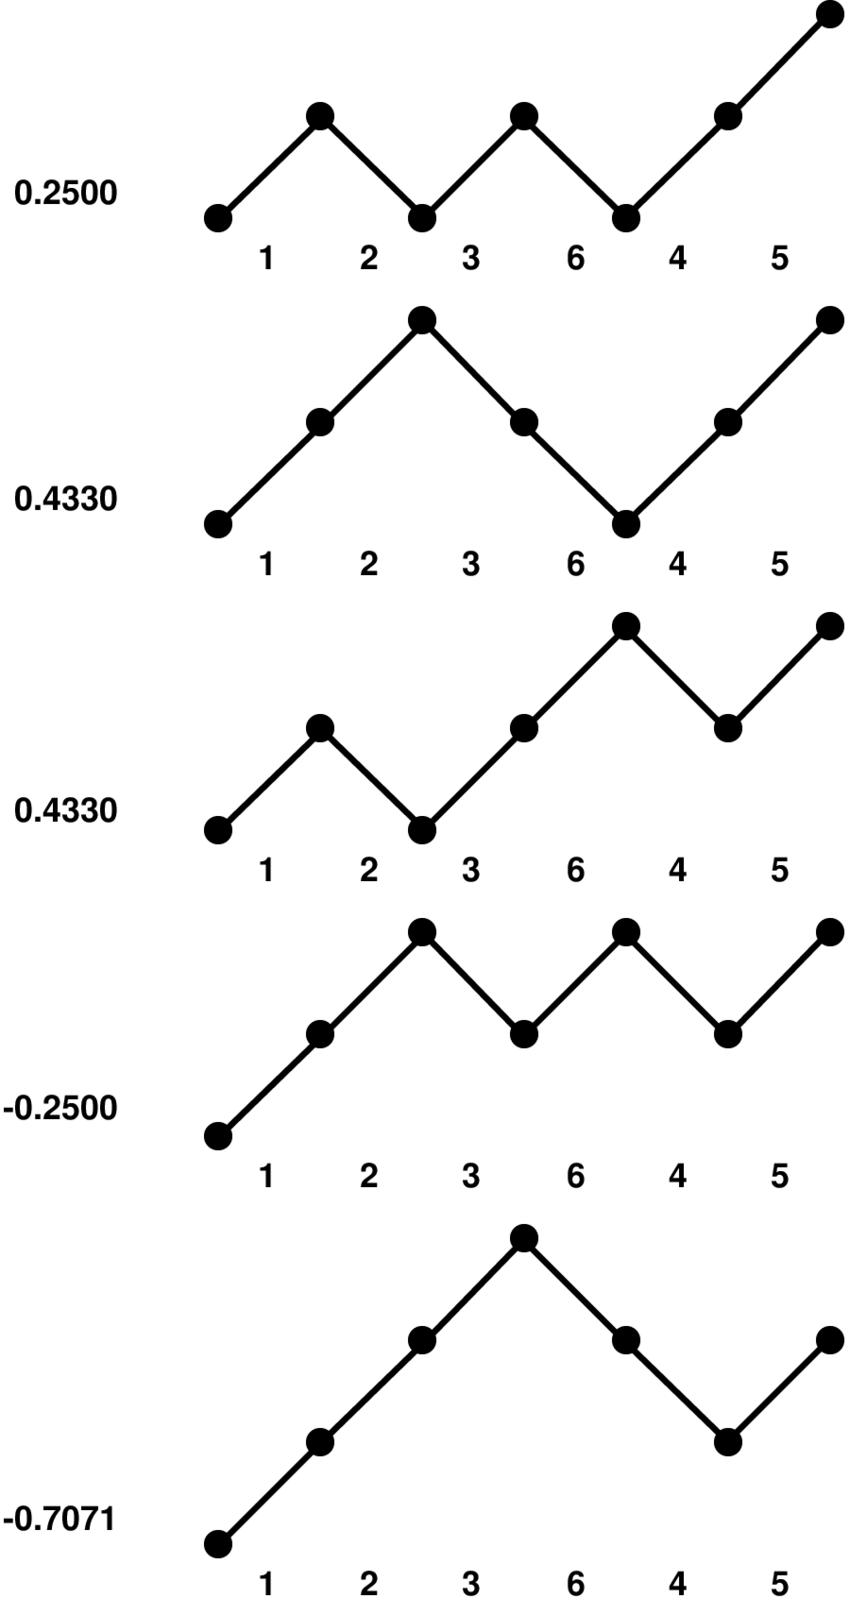 medium resolution of branching diagram of figure ii after reordering orbitals